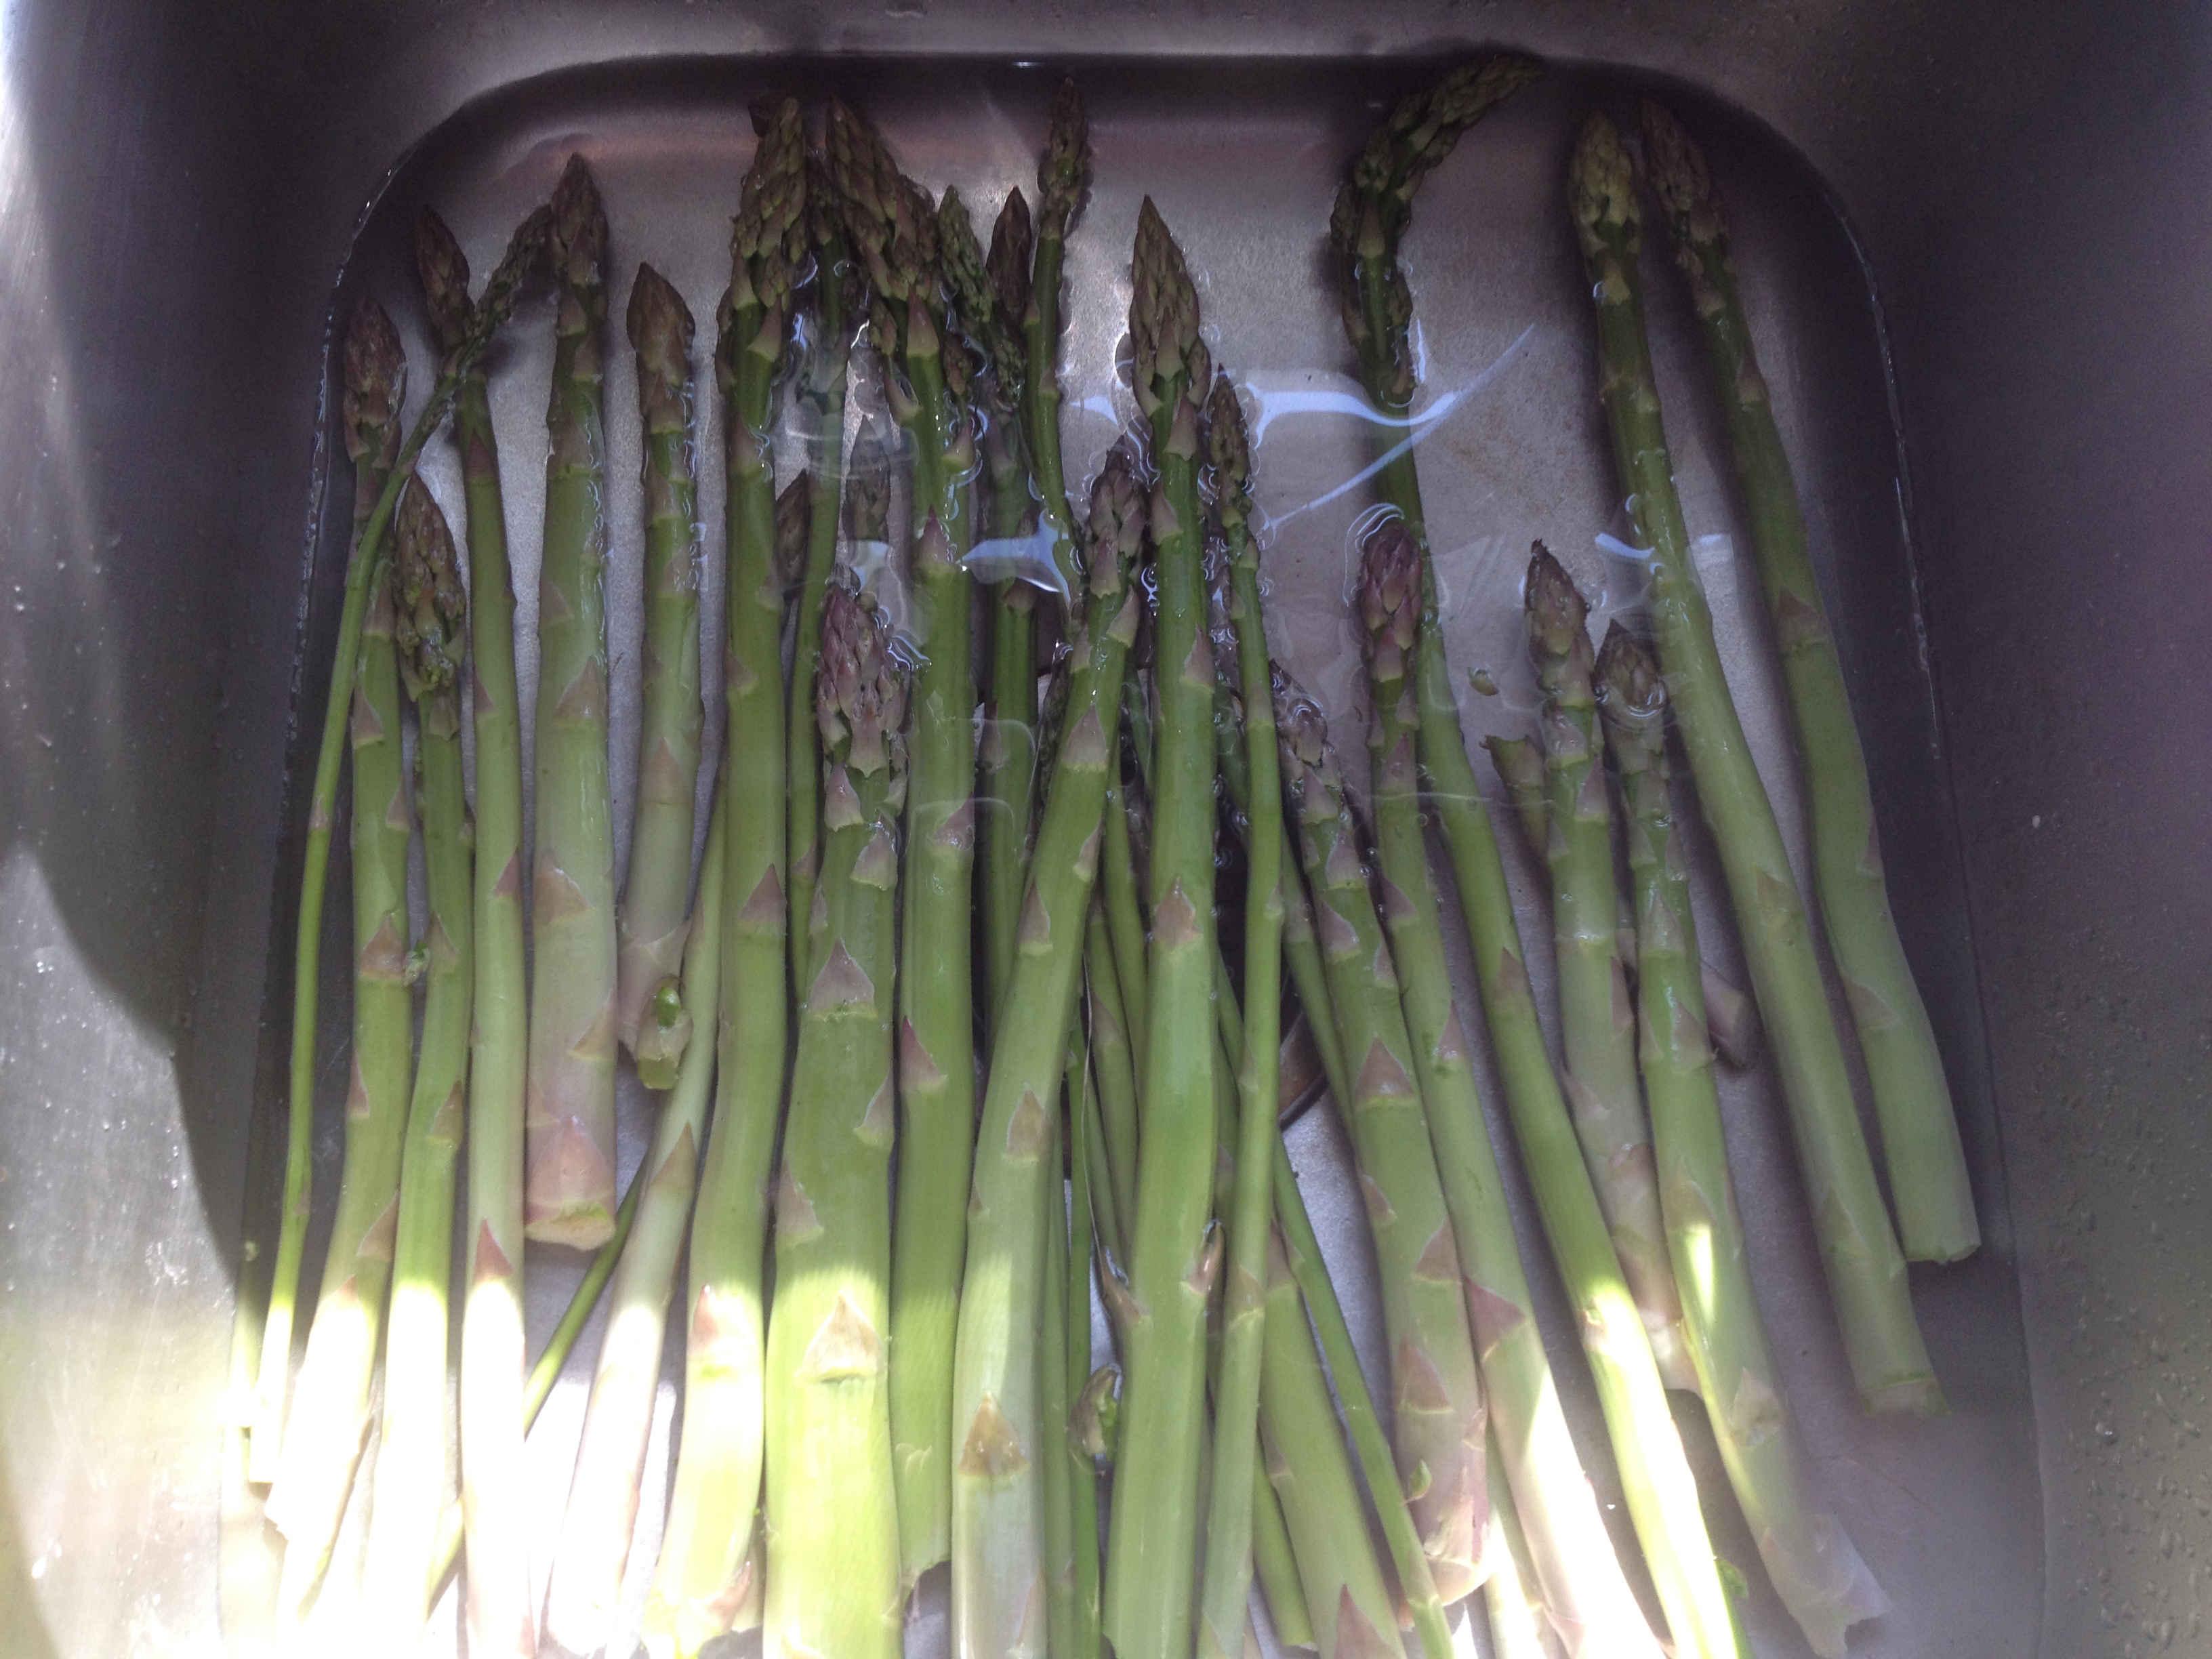 Washing Wild Asparagus